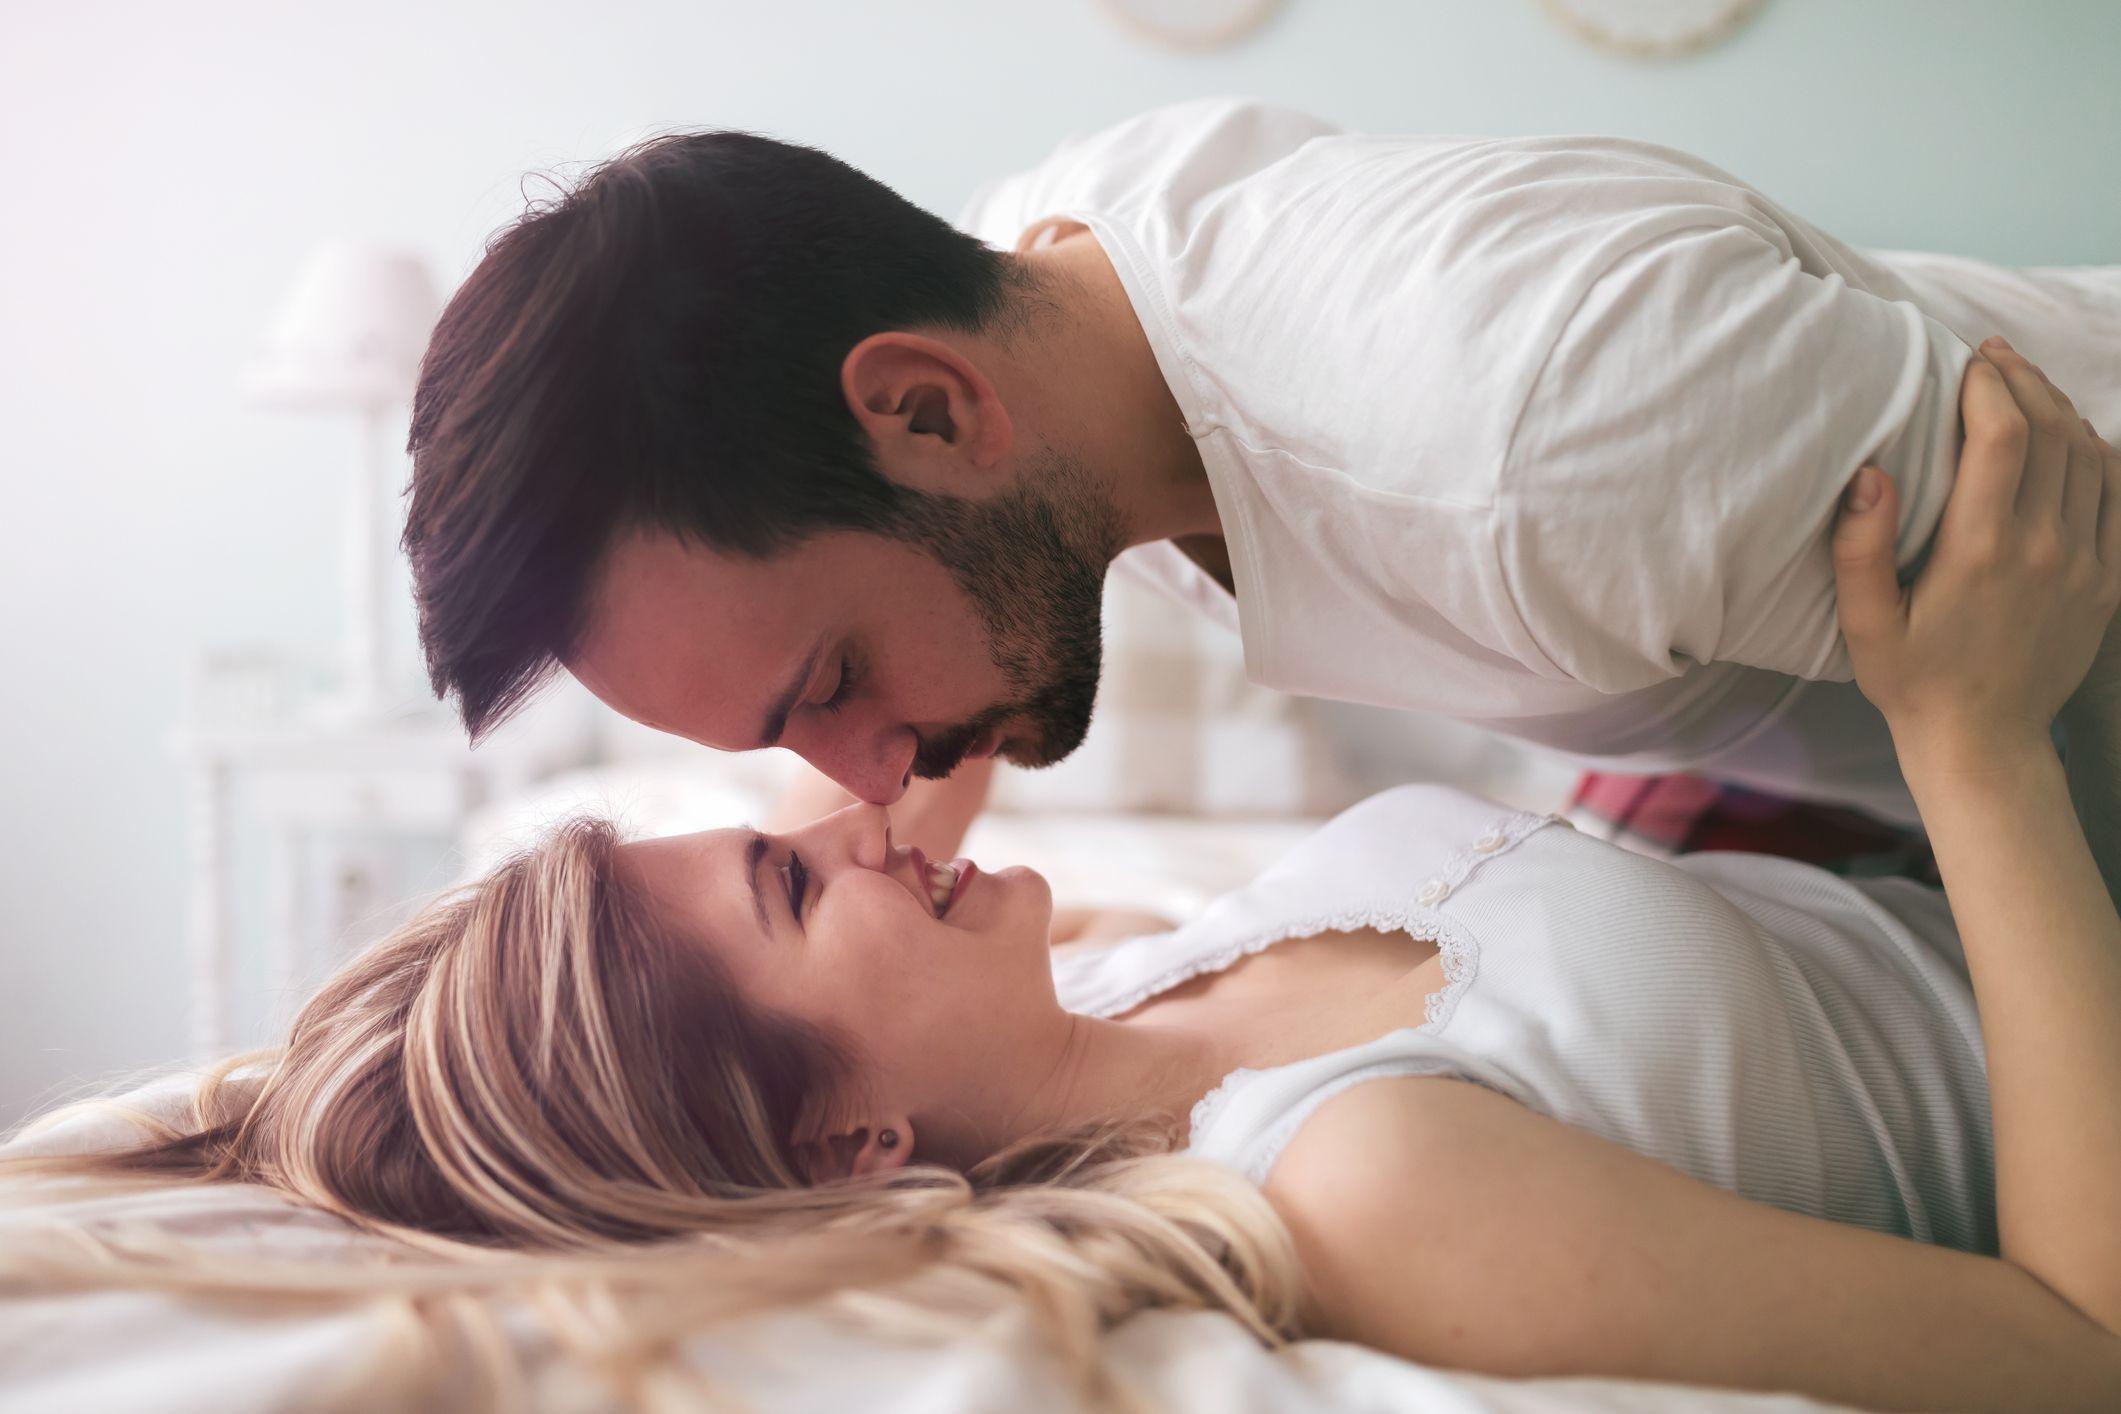 Expliquer sexe des flashing videos flashing@todorazor.com